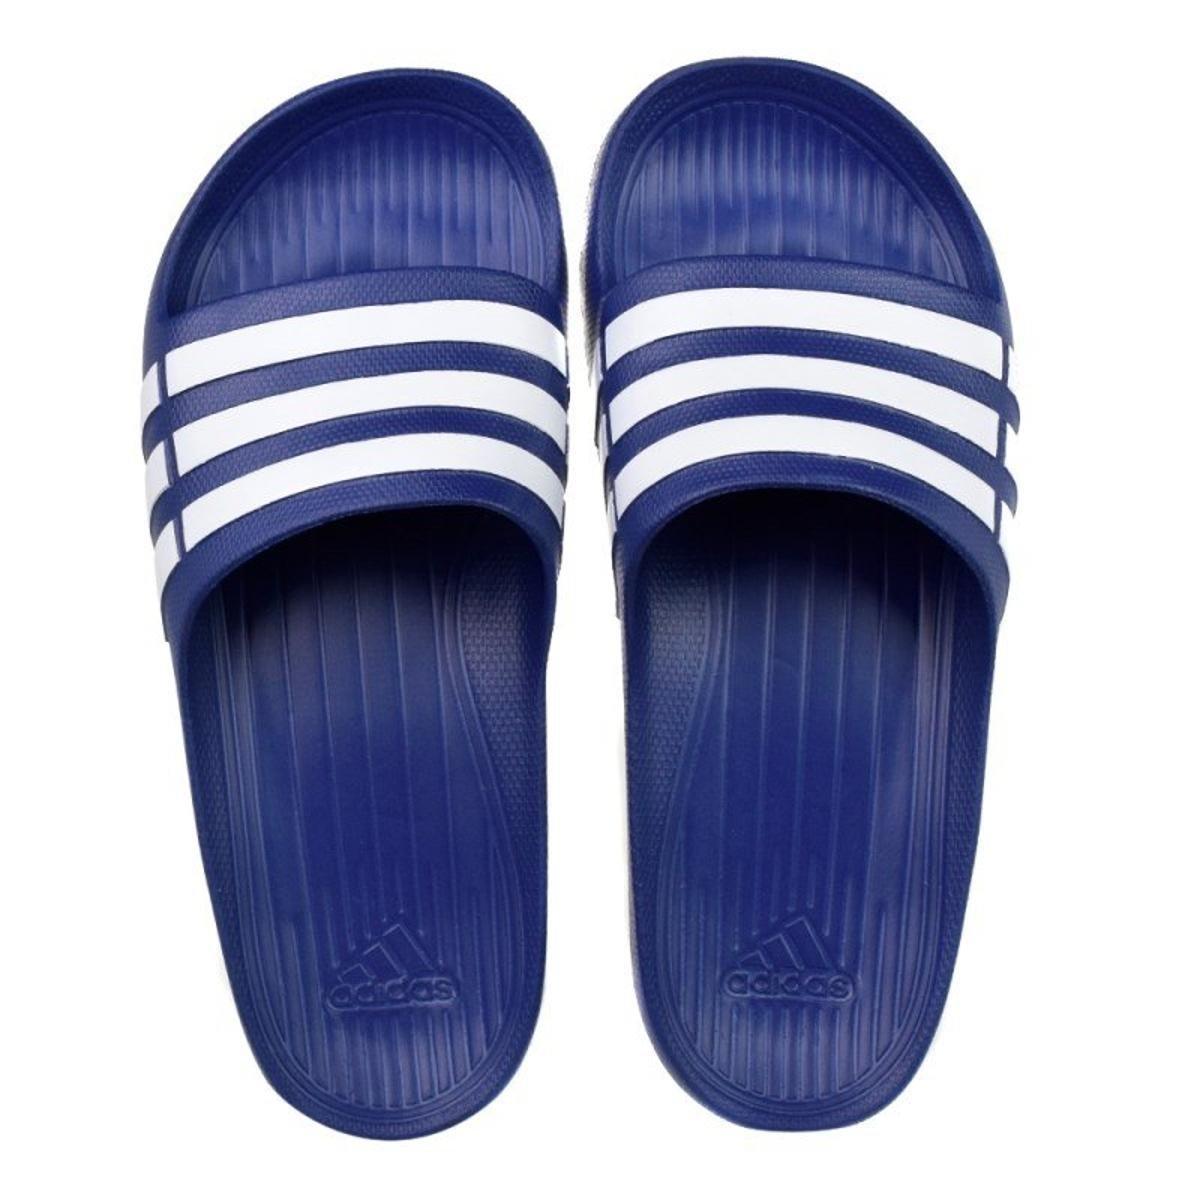 2e115dd5c40a Chinelo Slide Adidas Duramo - Azul e Branco - Compre Agora